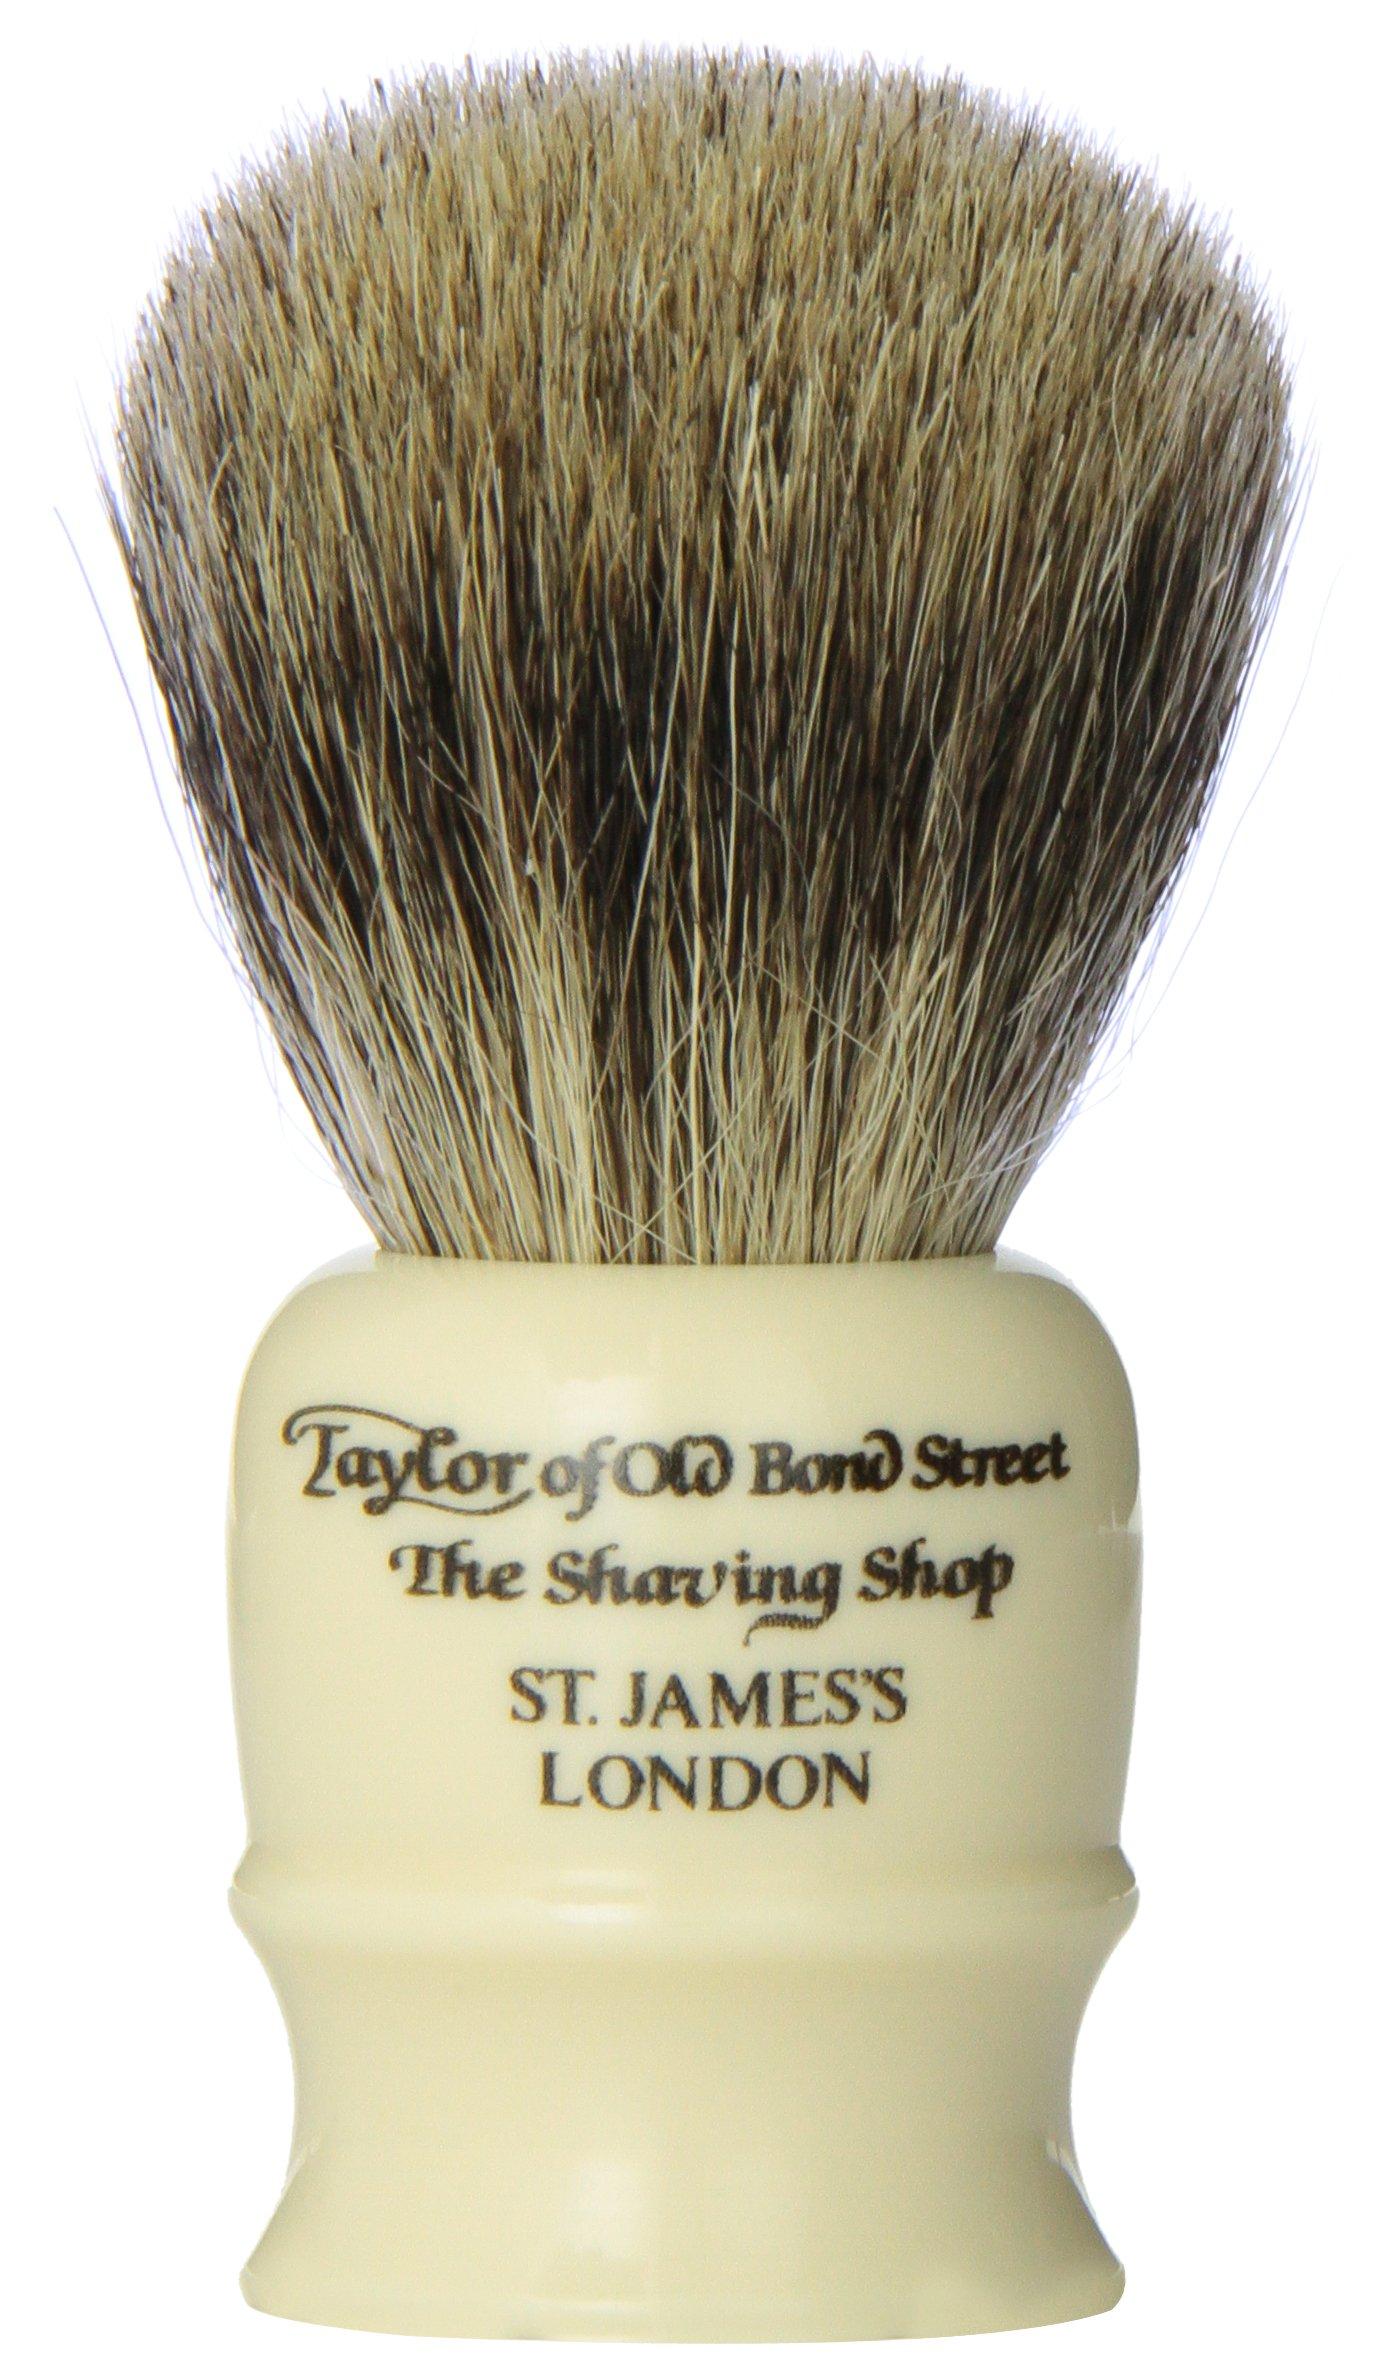 Taylor of Old Bond Street Pure Badger TRAVEL Shaving Brush - Ivory